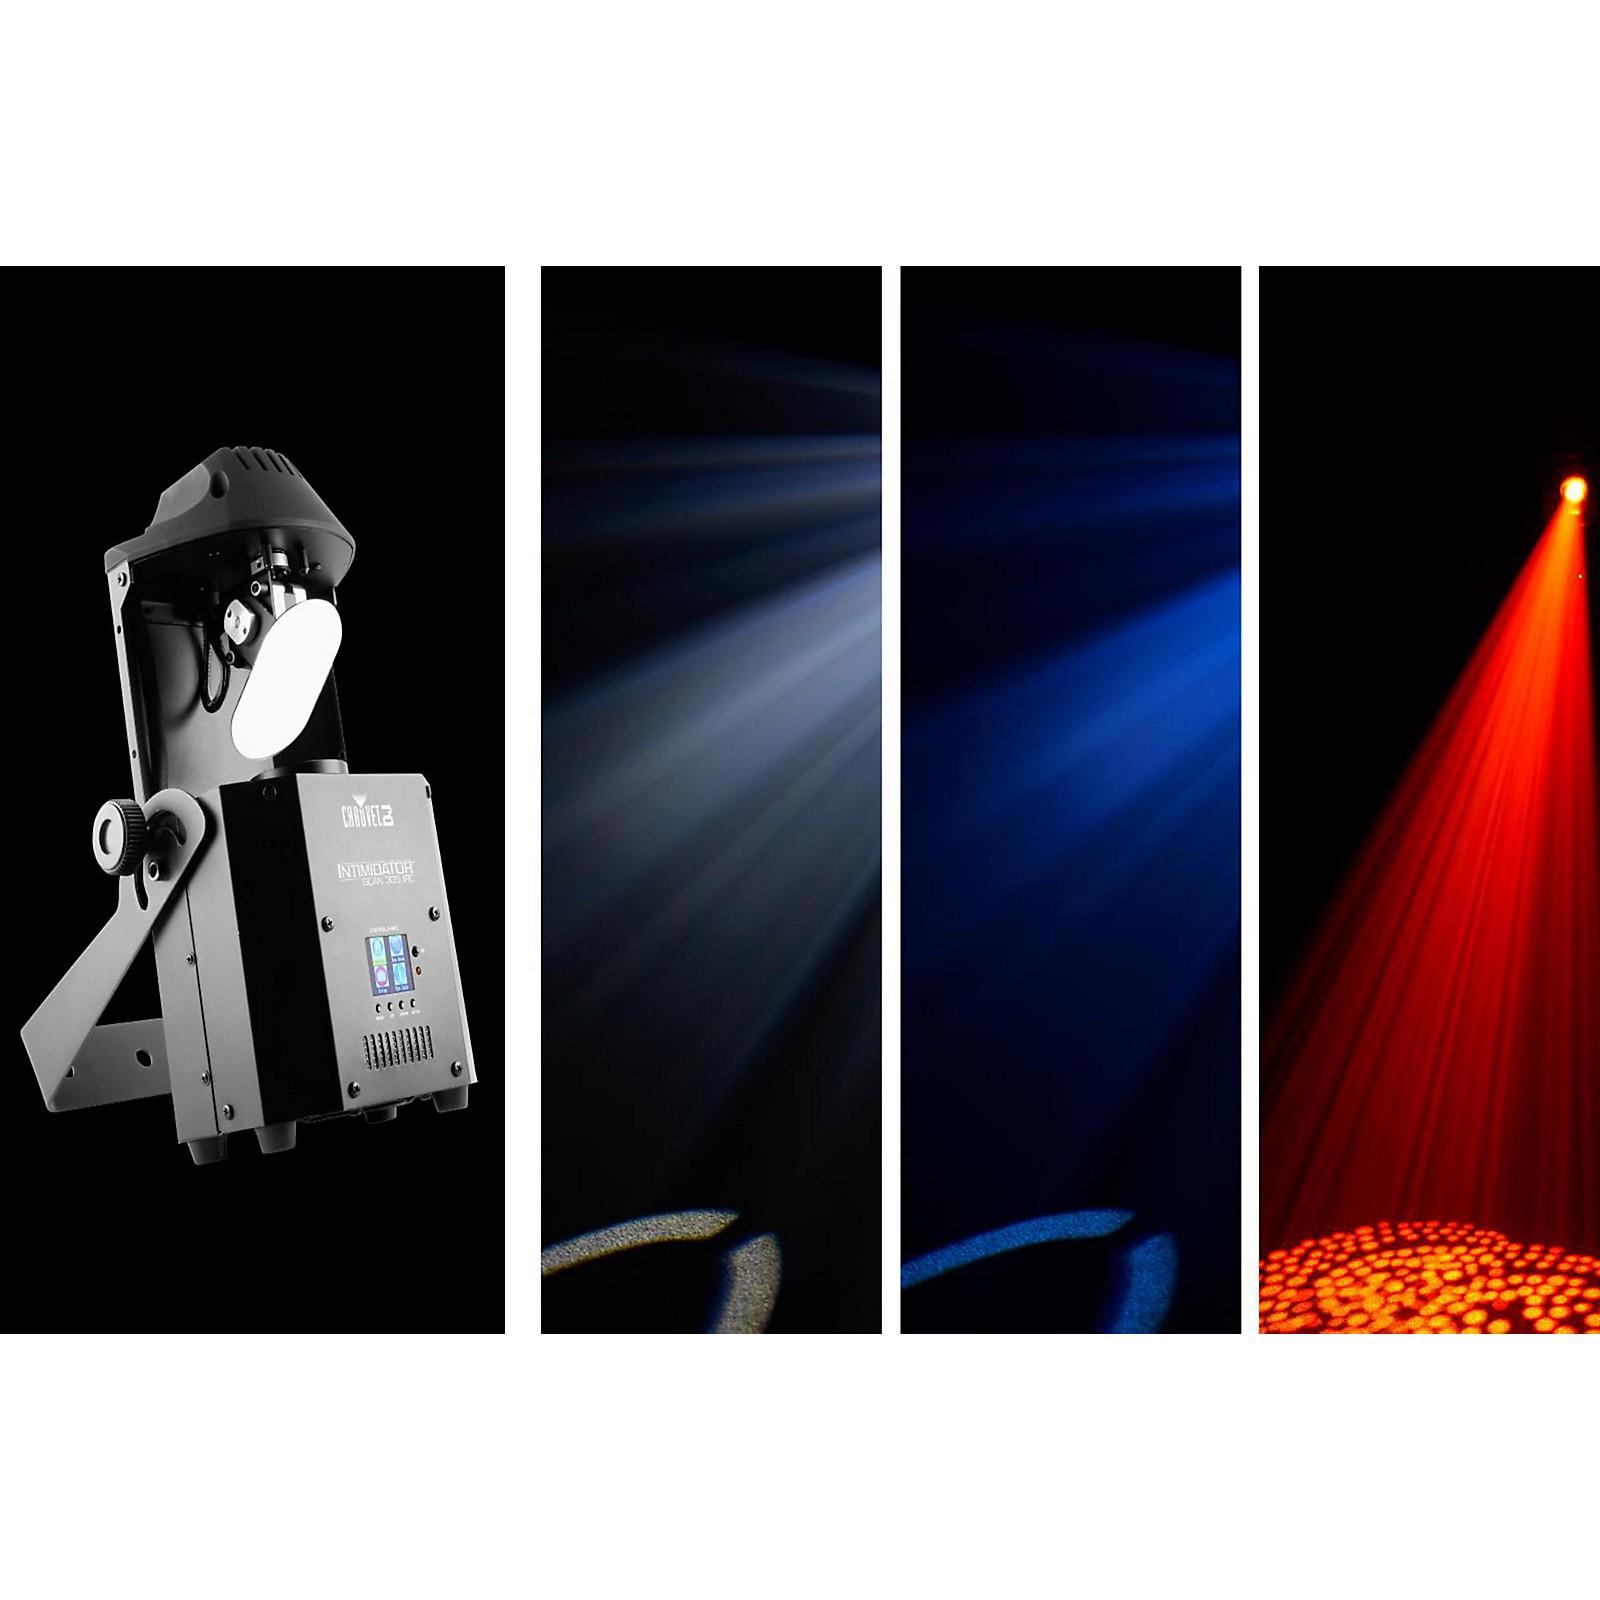 CHAUVET DJ Intimidator Scan 305 IRC Compact LED Scanner/Moving Head Effect Light